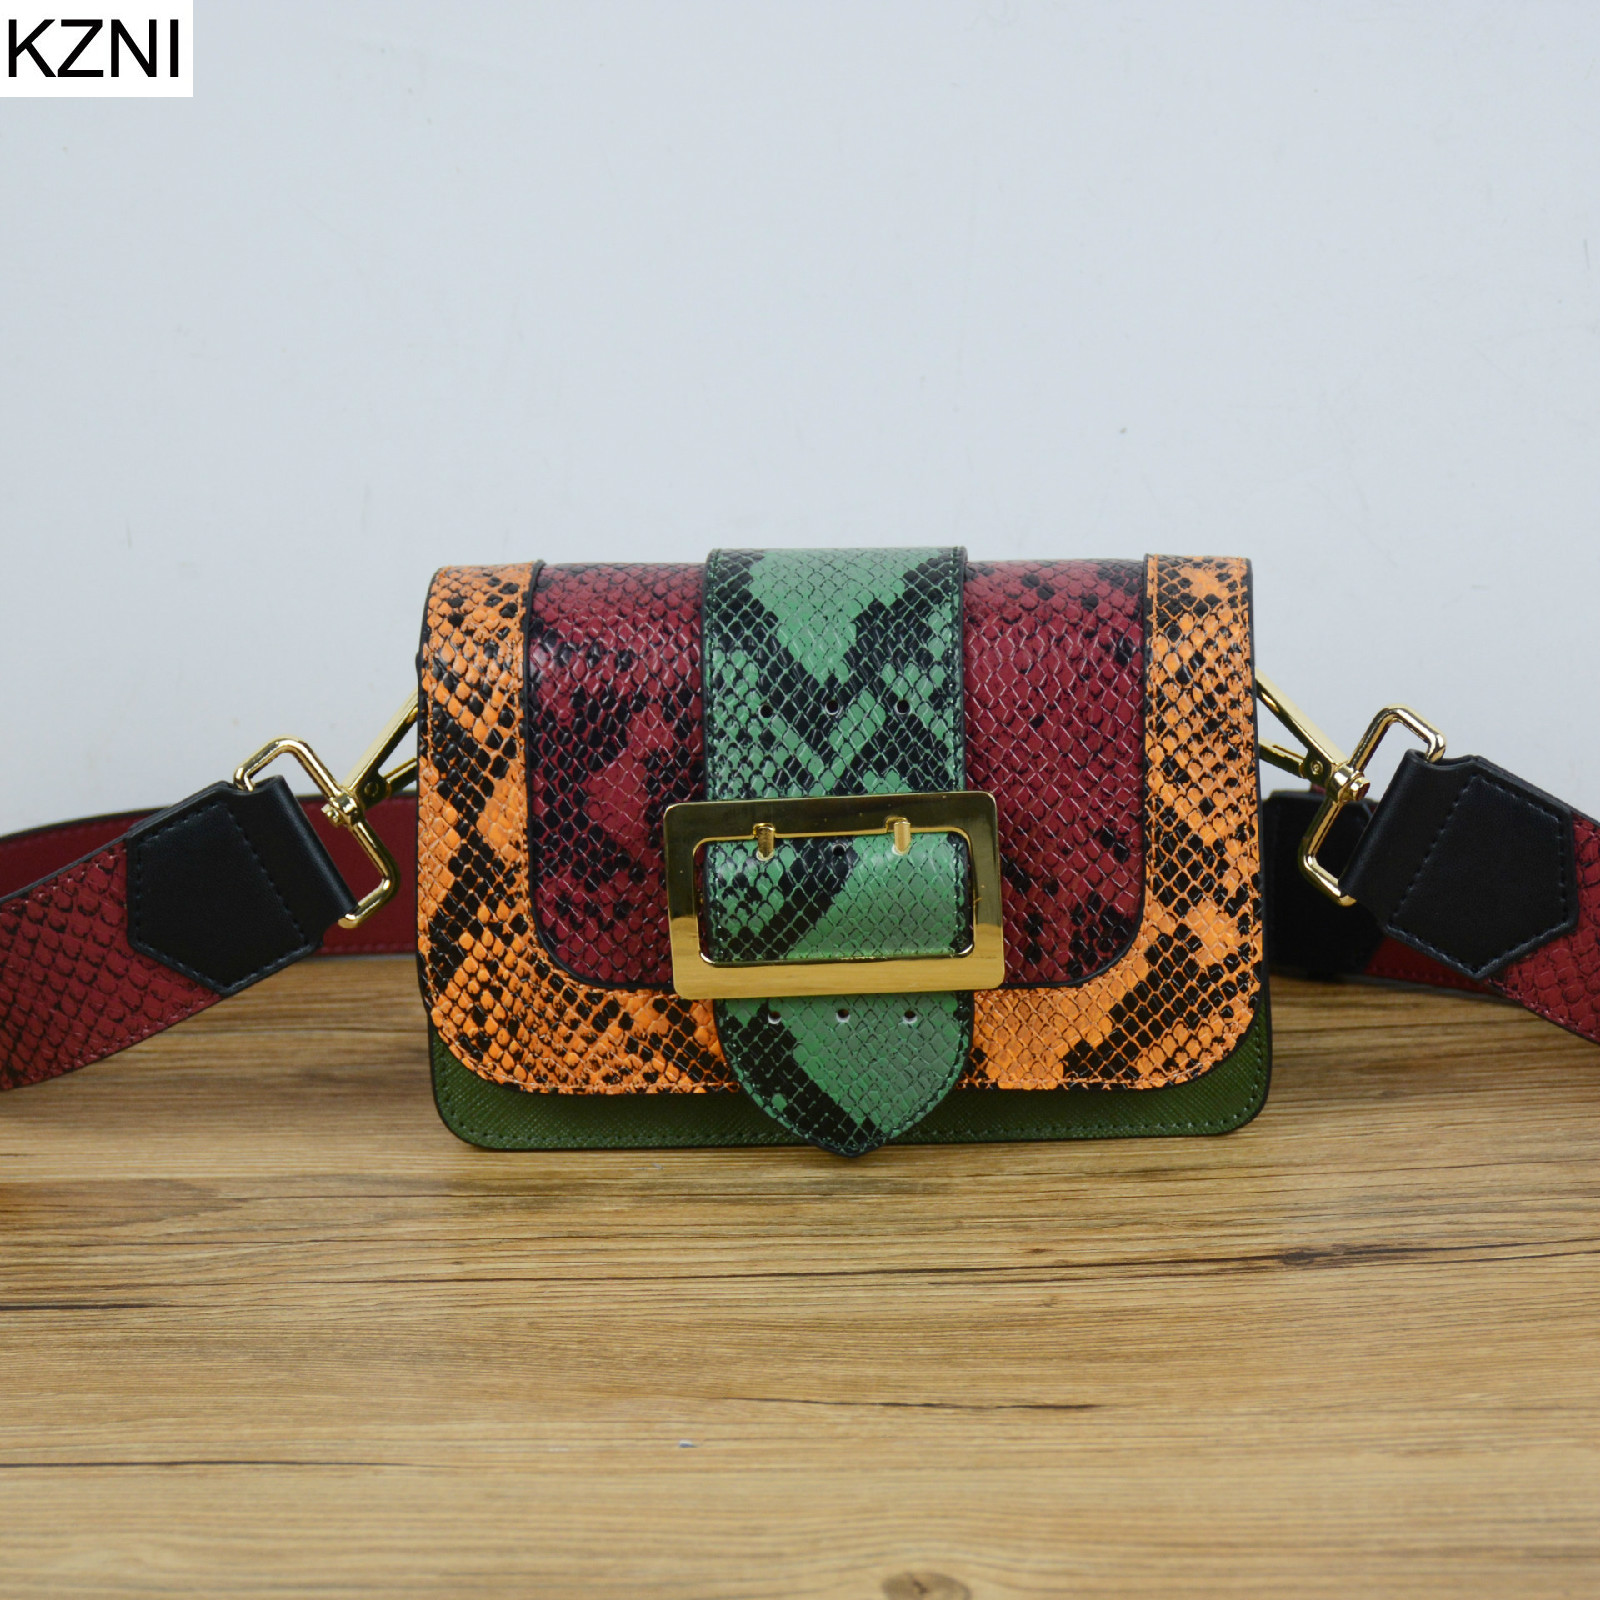 ФОТО KZNI genuine leather women bags designer handbags high quality vintage carteras mujer marcas famosas cuero genuino L031330